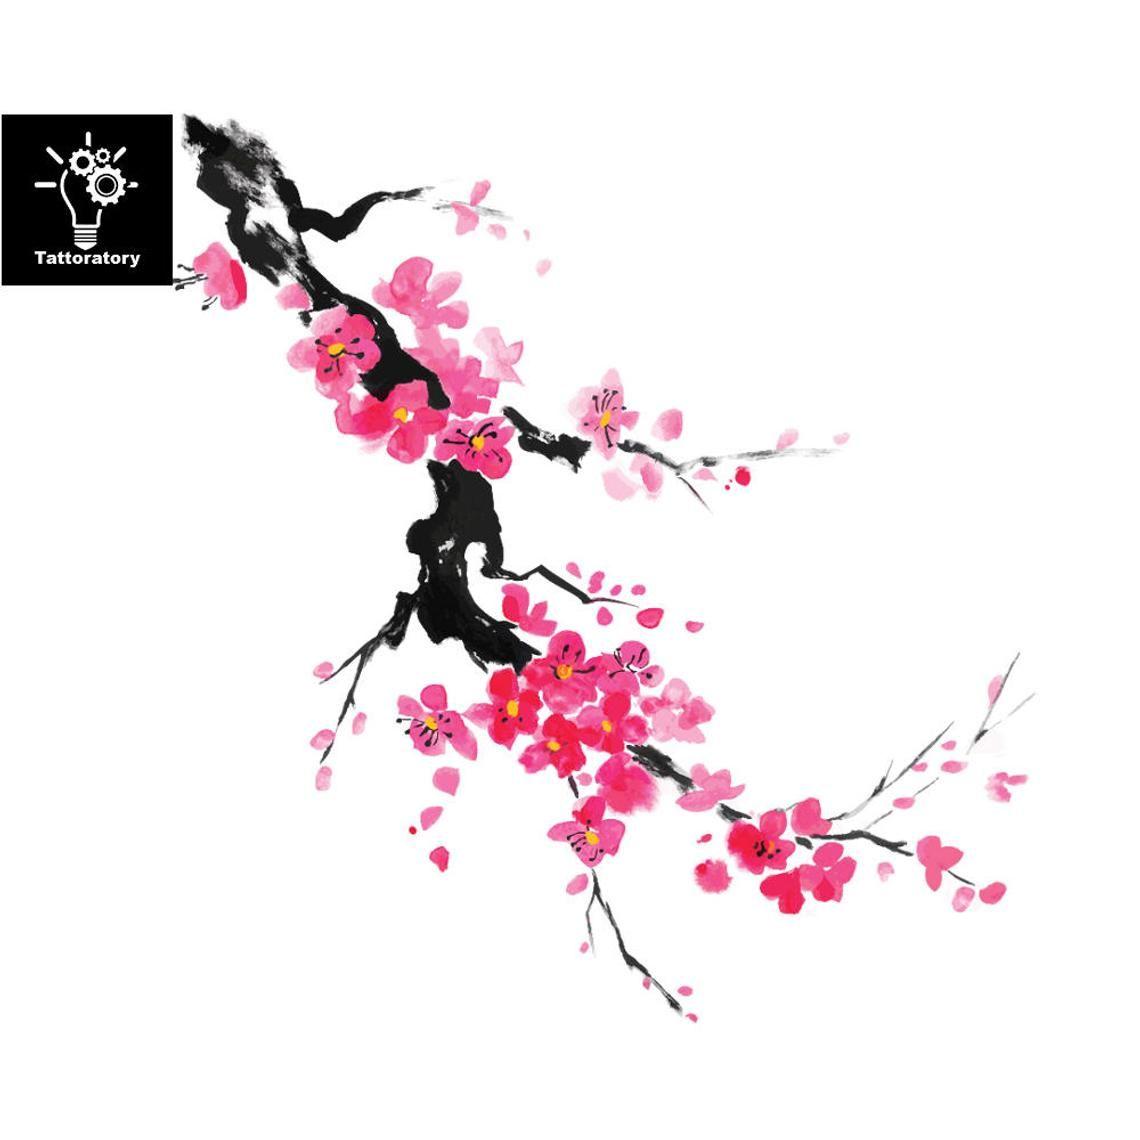 Cherry Blossom Tattoo Watercolor Tattoo Sakura Tattoo Etsy In 2021 Sakura Tattoo Cherry Blossom Tattoo Flower Tattoo Shoulder